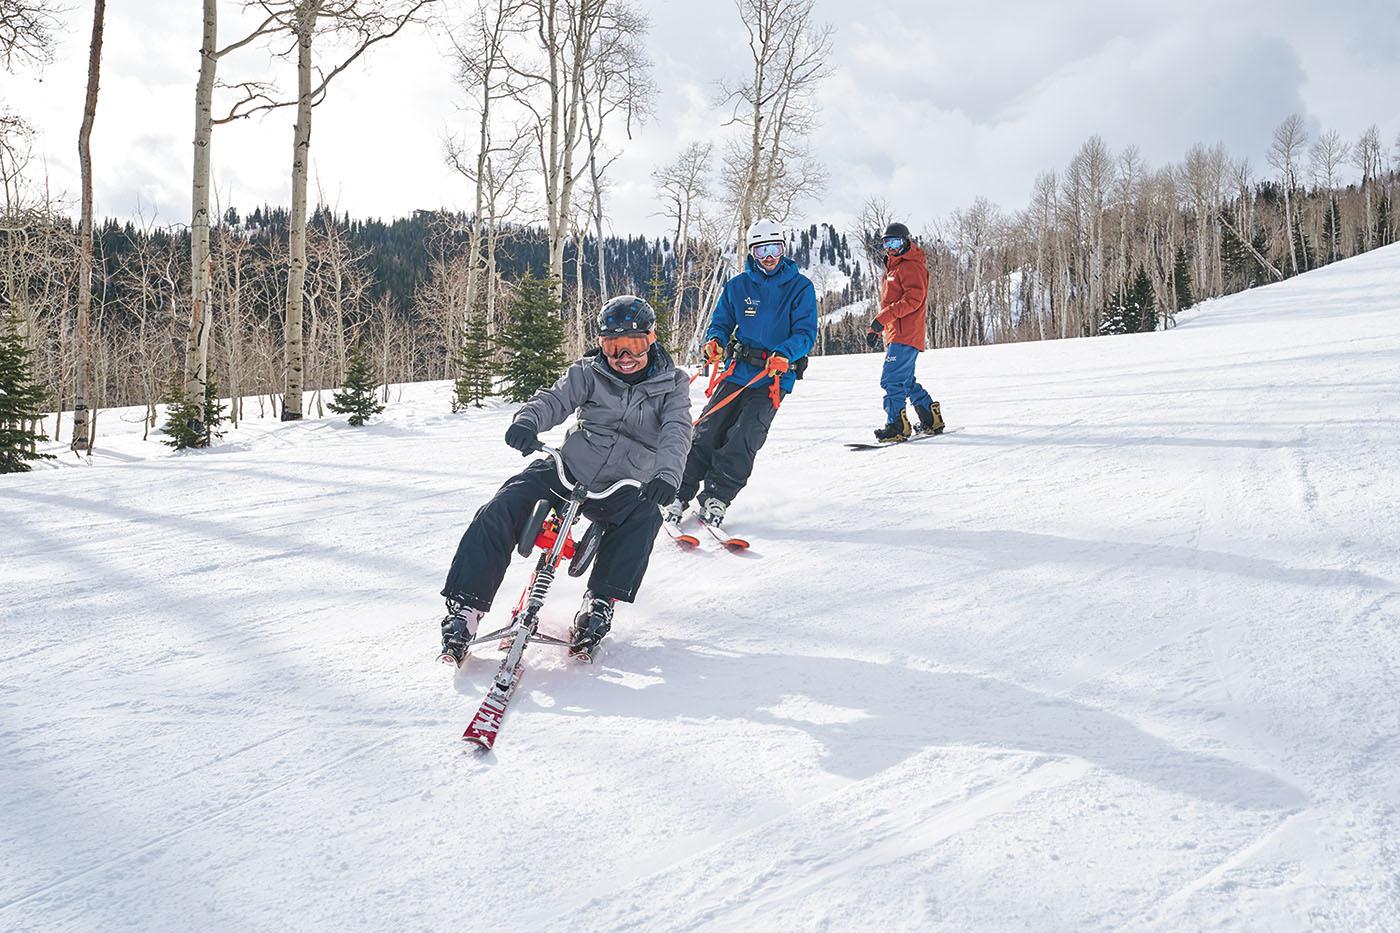 (L–R) Serei Panh, Ski, Snowboard Program Manager Brian Castillo and Snowboard Head Coach/Program Equipment Supervisor Colton Bradley enjoy riding at Park City Mountain as a part of the National Ability Center's adaptive-recreation program.